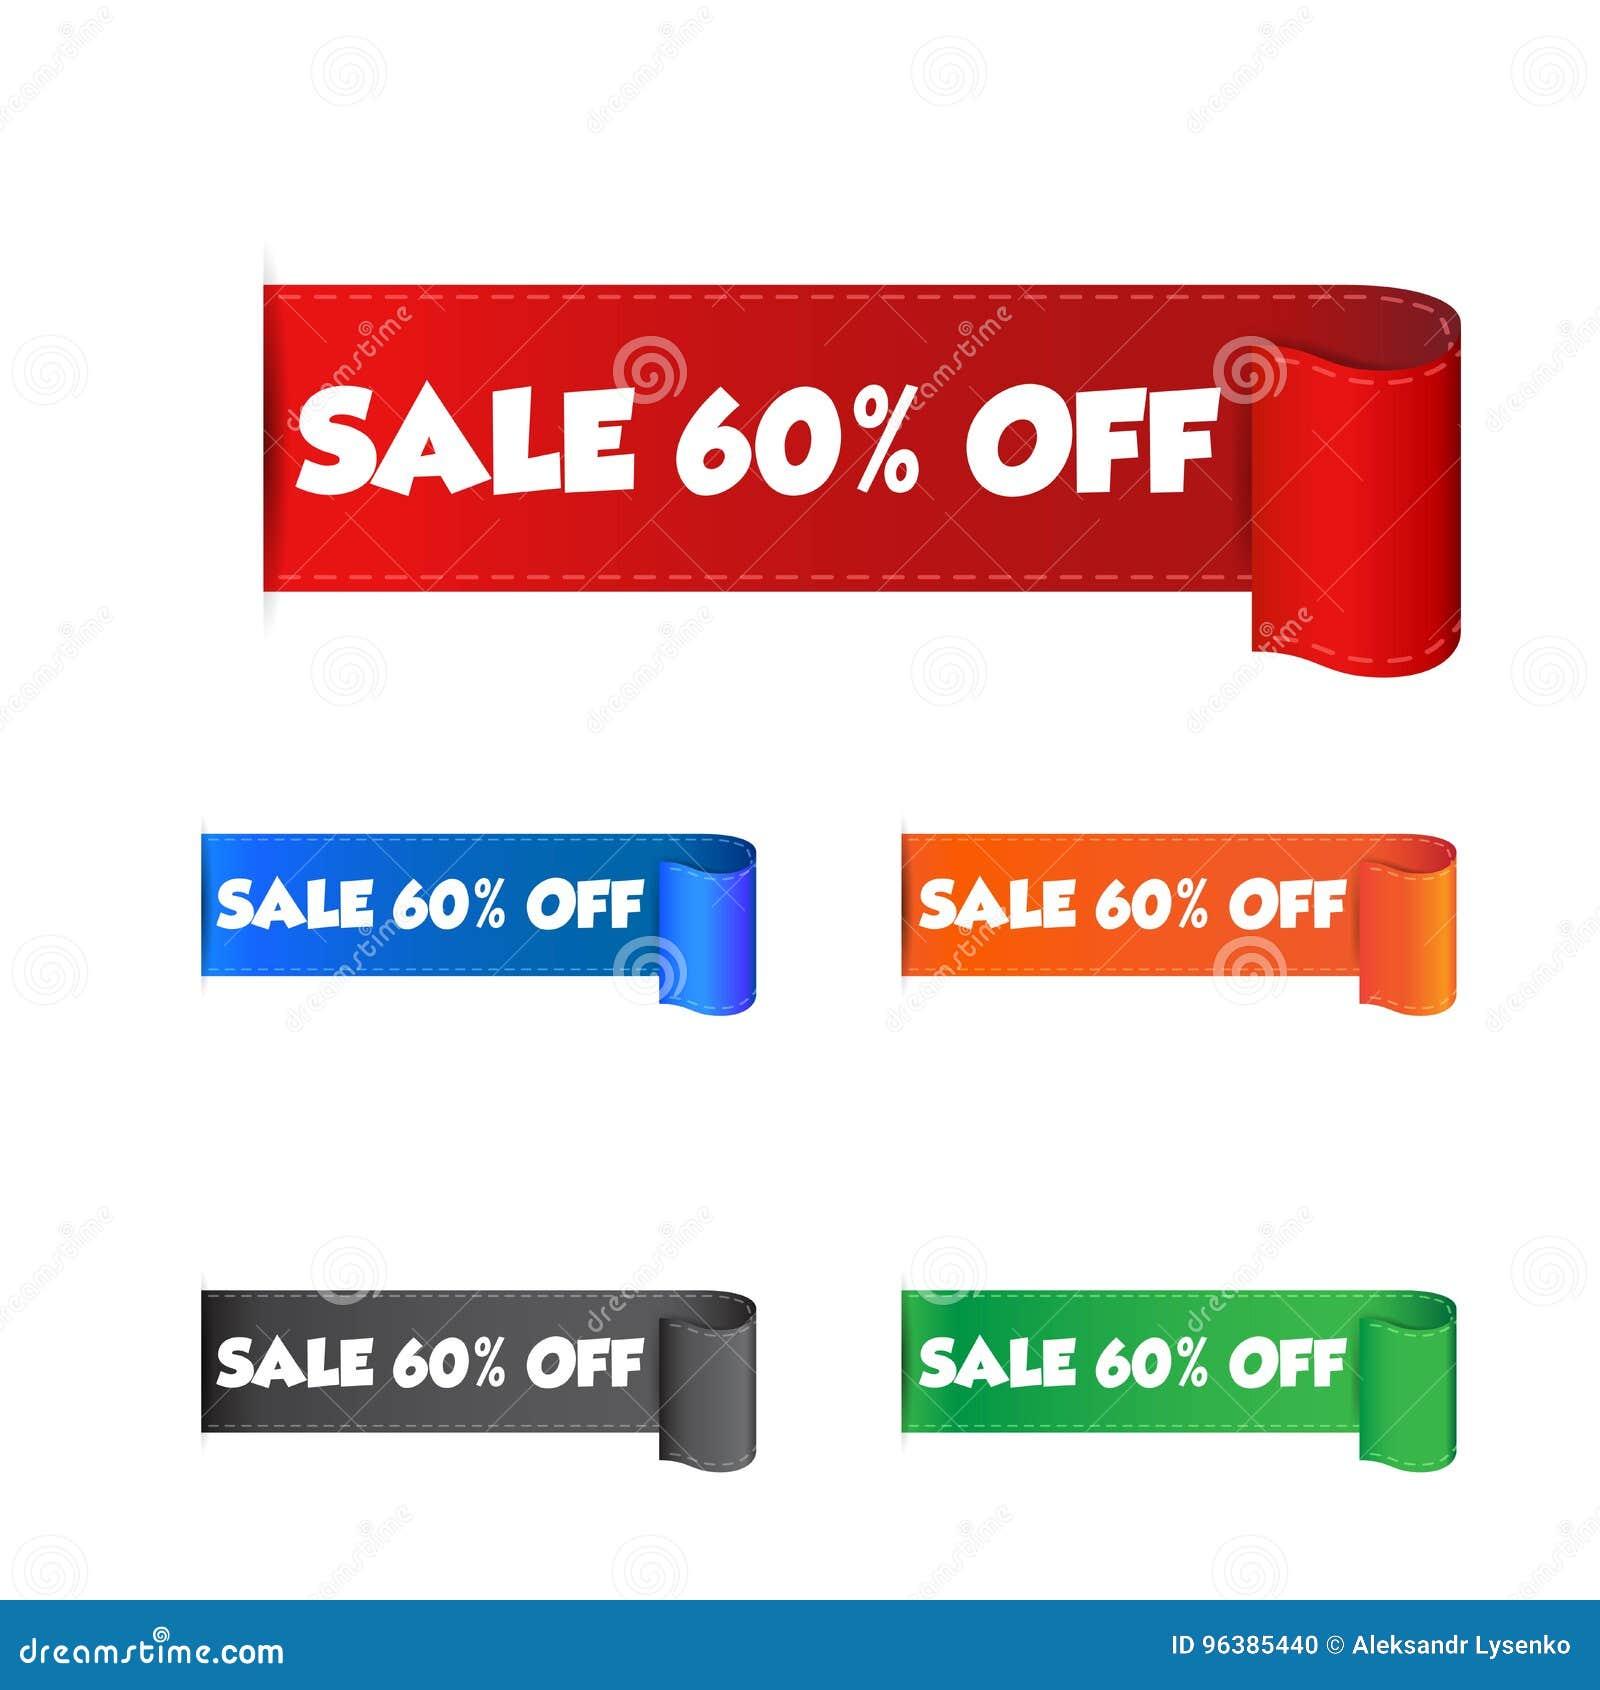 6d6593f67 Sale 60% Off Sticker. Label Vector Illustration On White Background ...